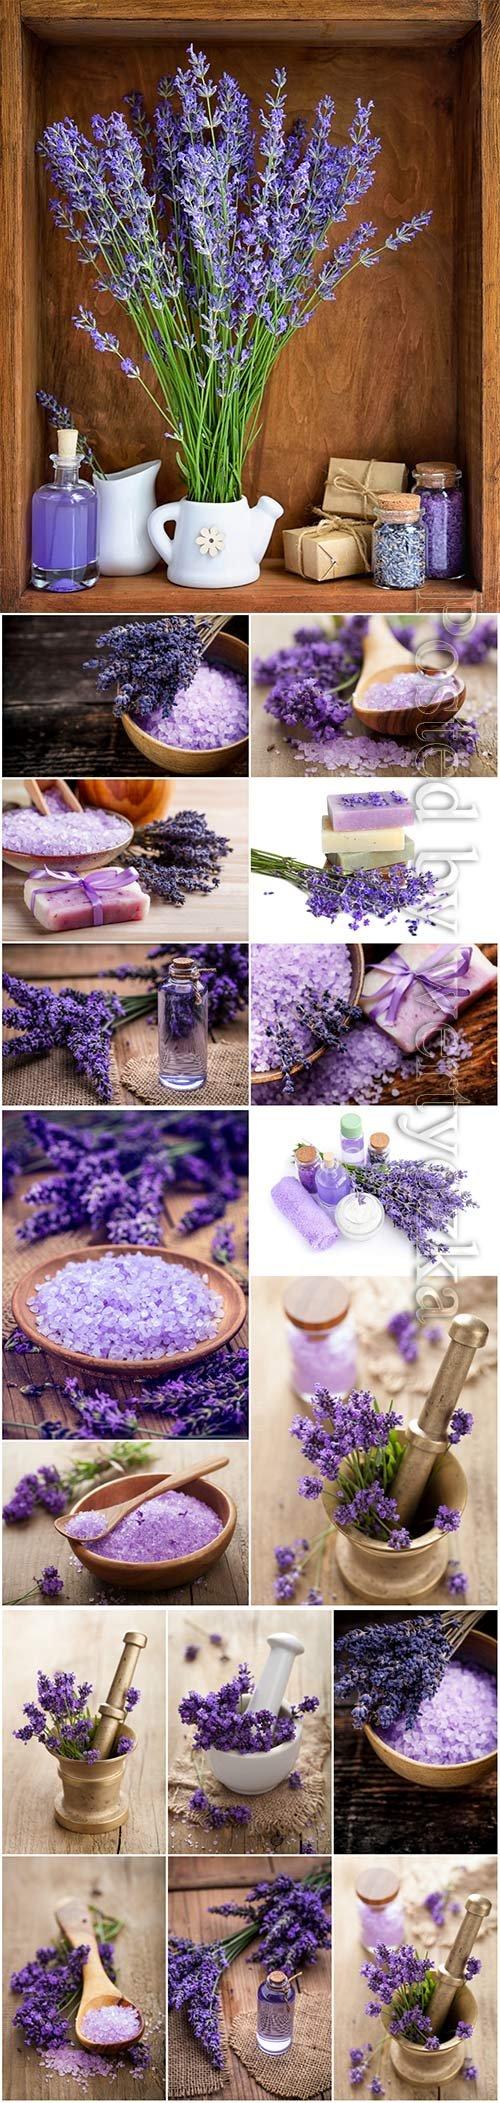 Lavender, spa concept beautiful stock photo